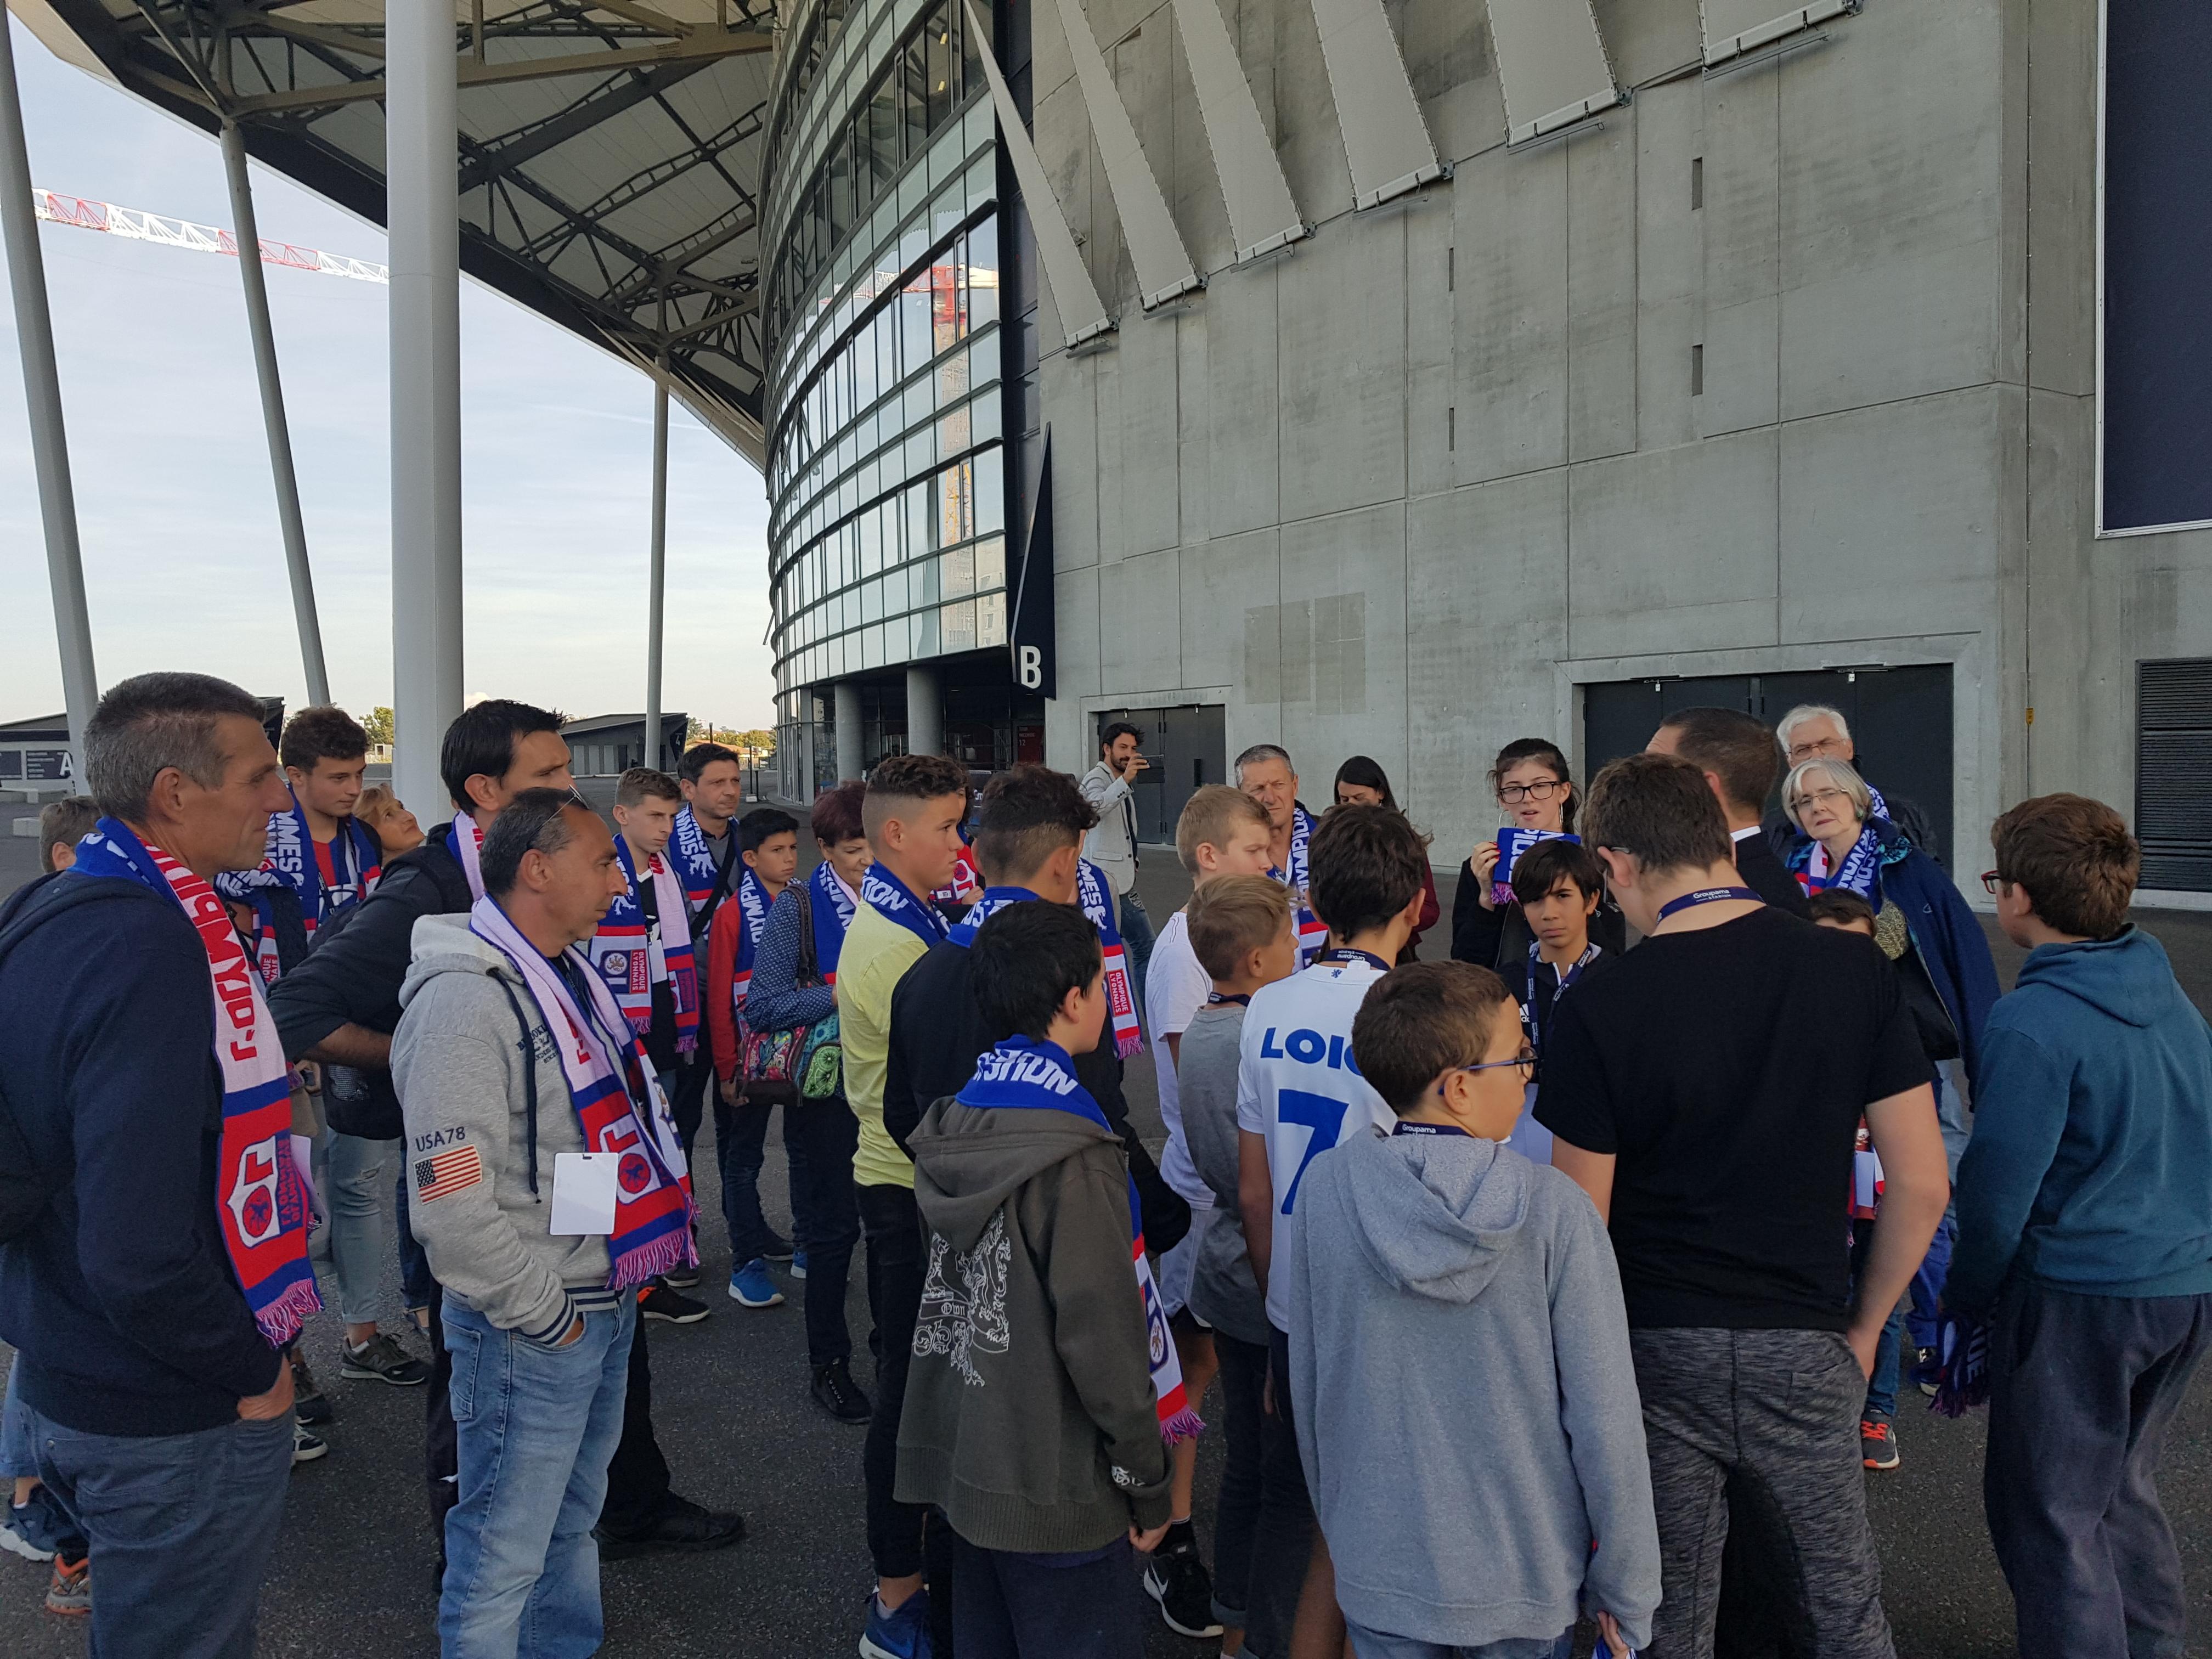 OL Anthony Jaffre Le Groupama Stadium A Une Me Quality 386f5 3e21e Visite